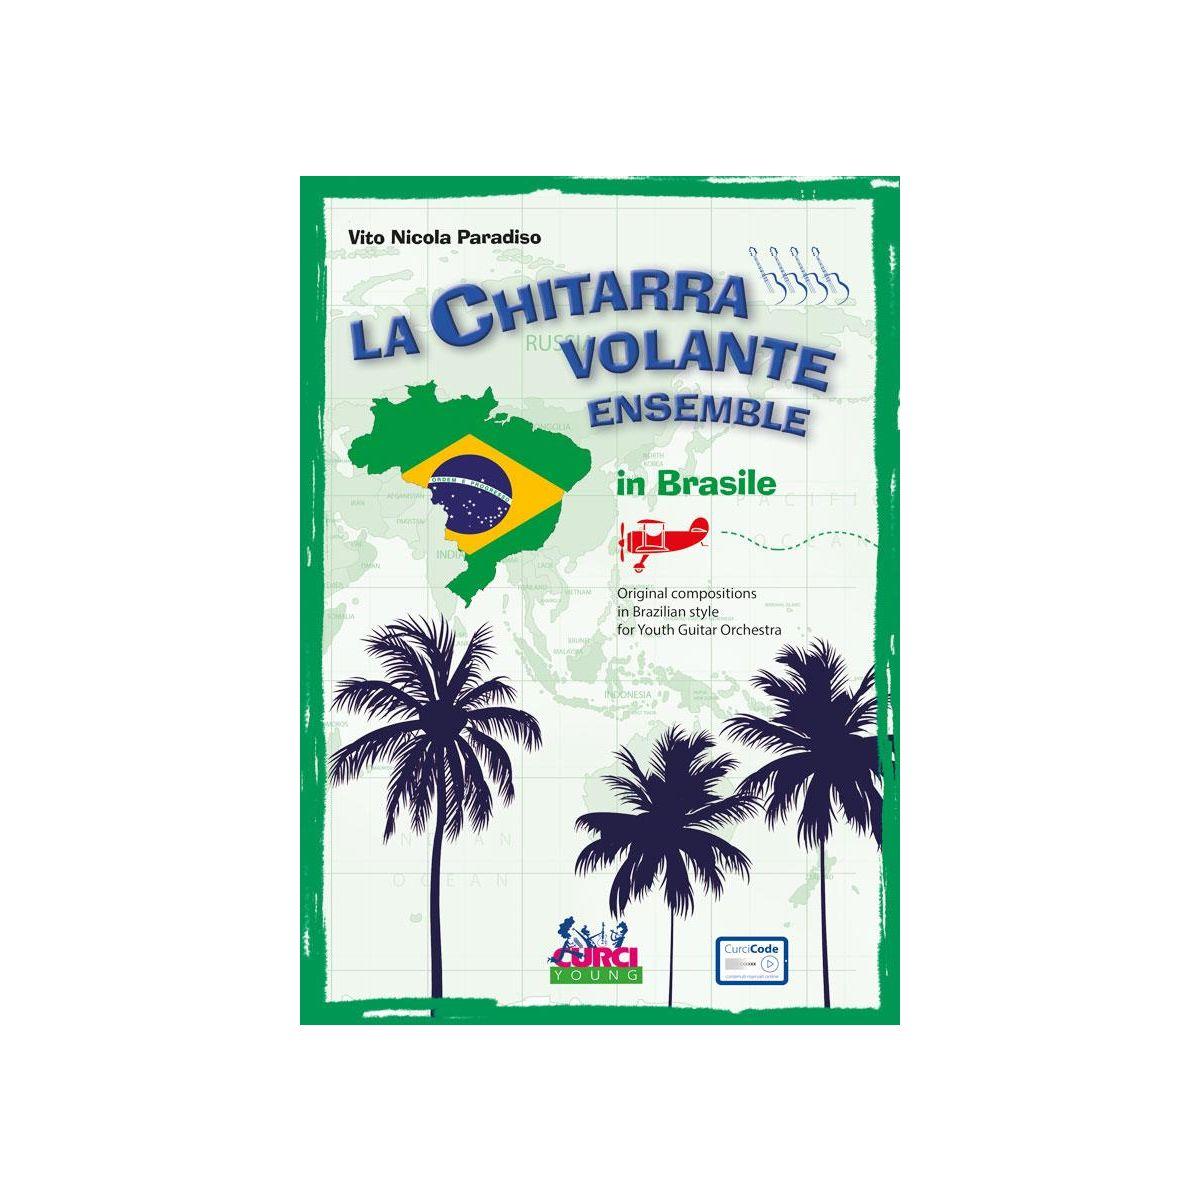 Paradiso La Chitarra Volante Ensemble in Brasile